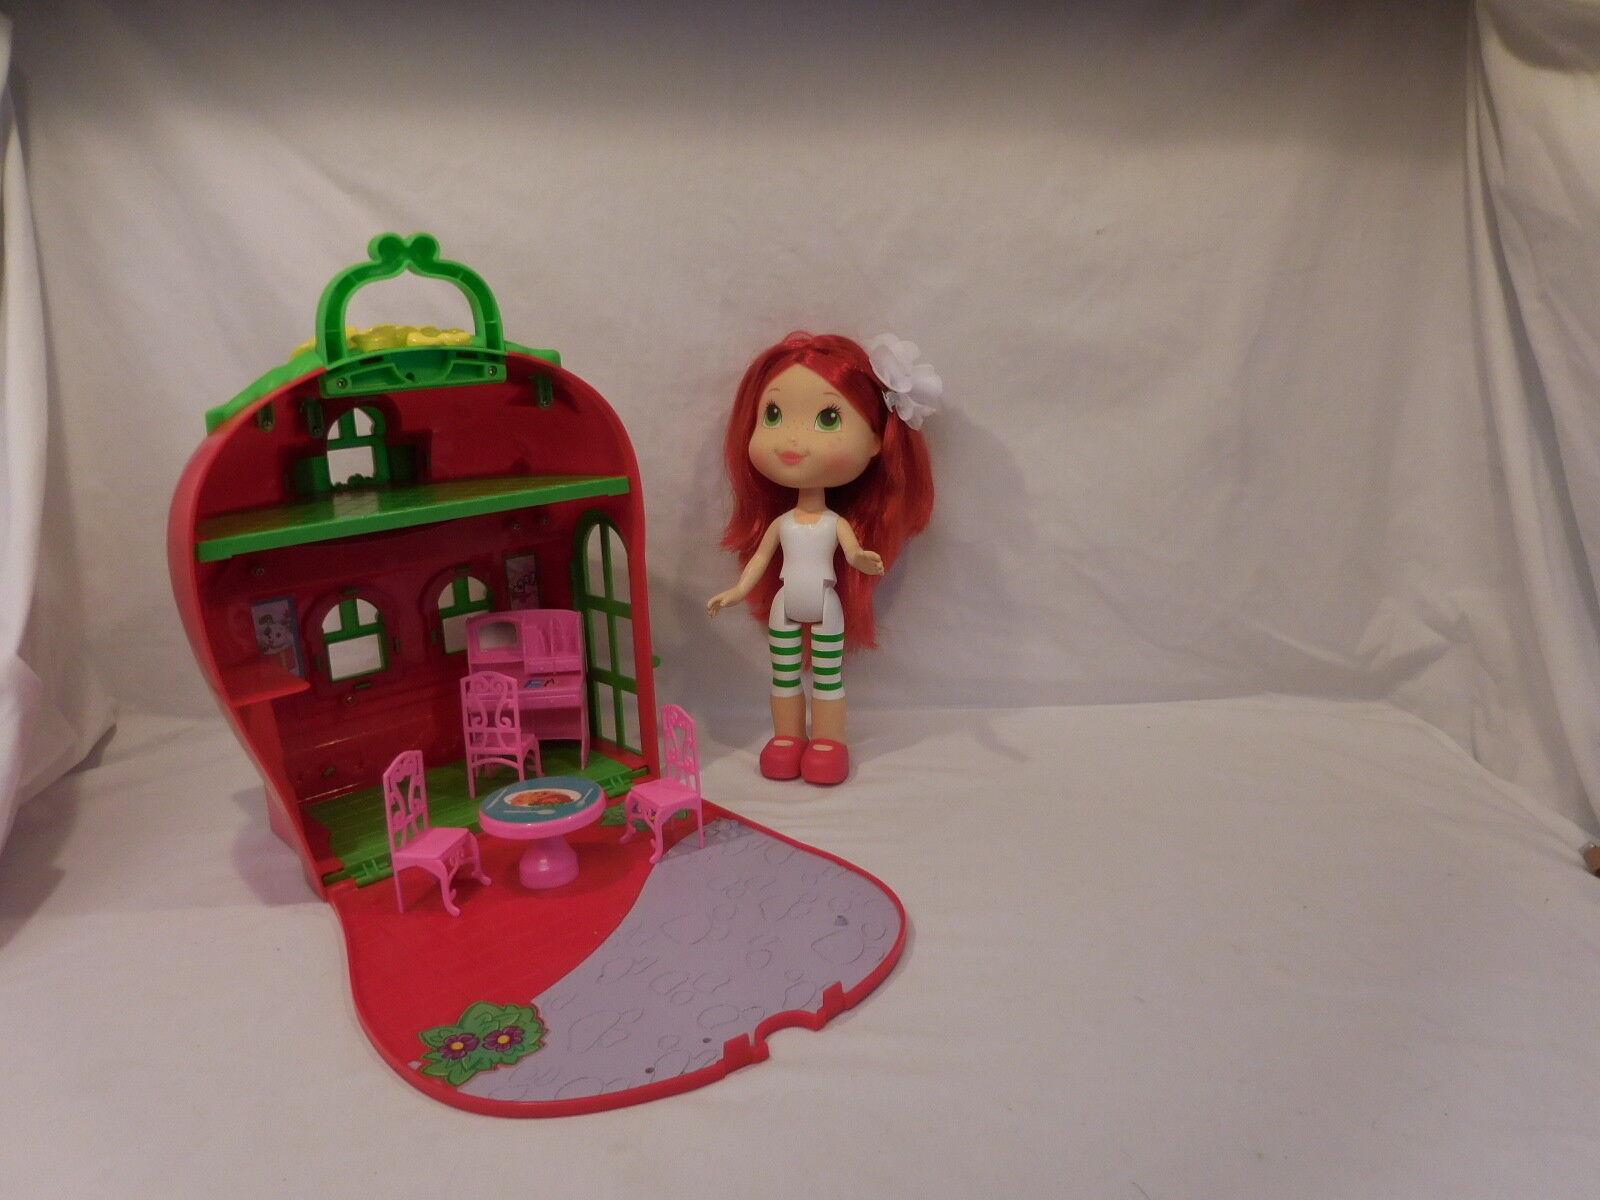 Strawberry Shortcake Party House + Large Strawberry Doll